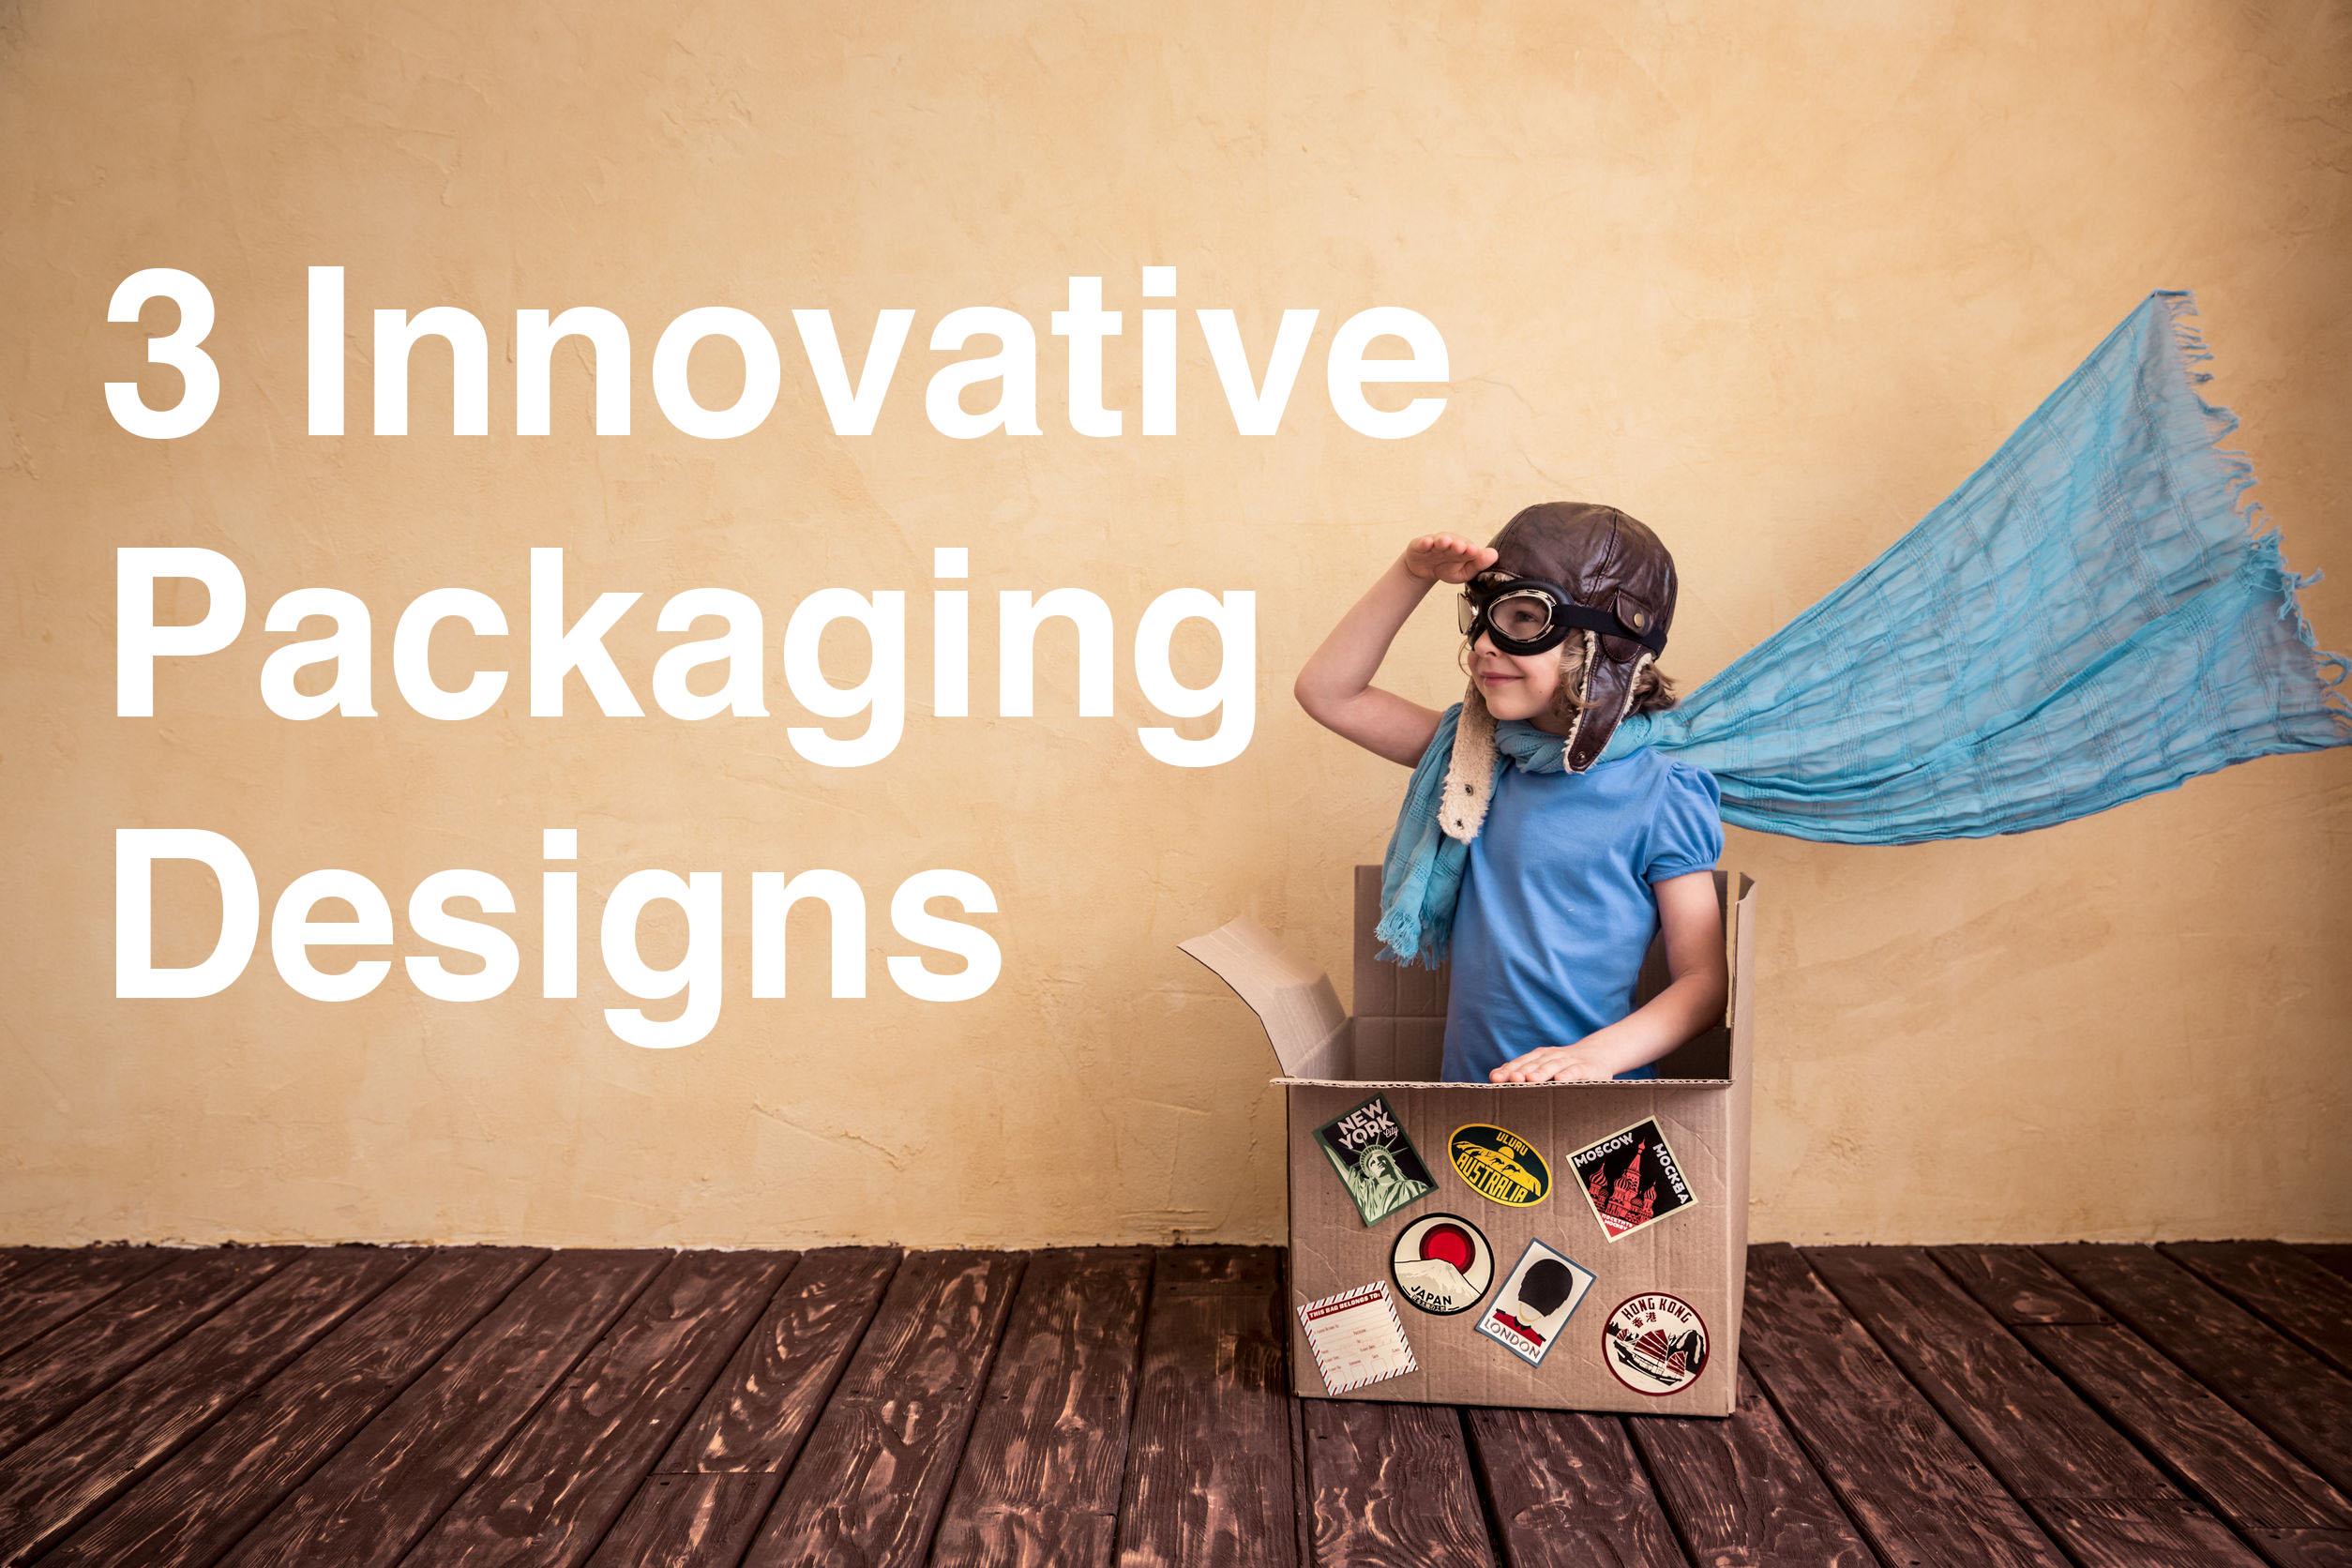 3 Innovative Packaging Designs